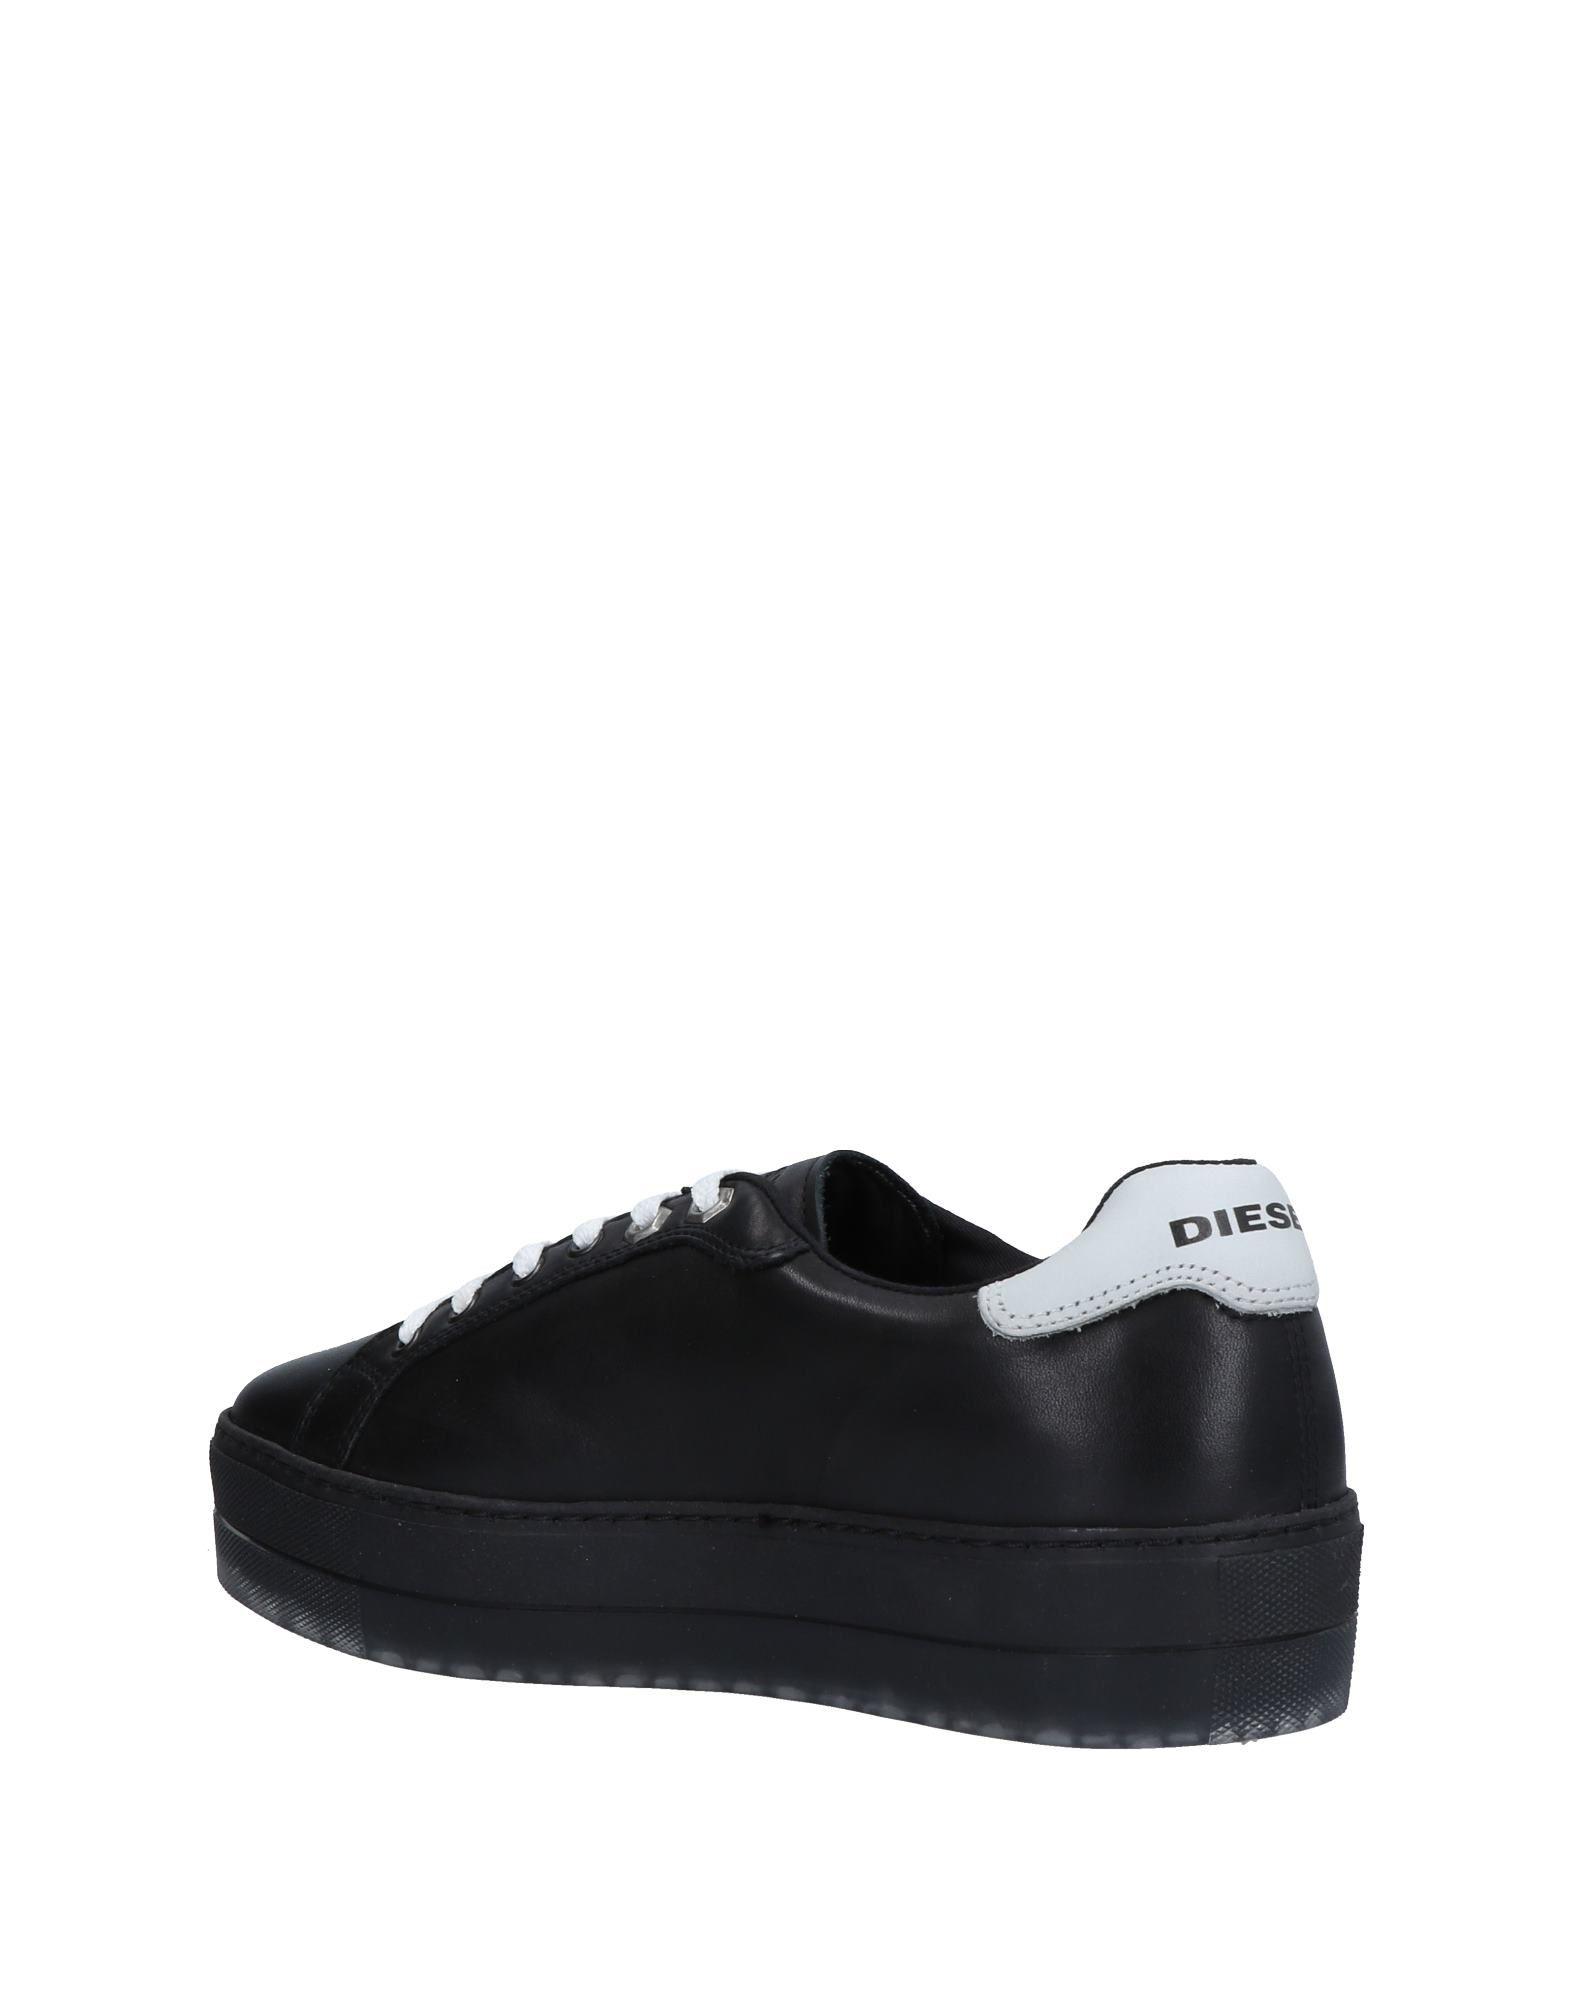 Diesel Diesel Diesel Sneakers - Women Diesel Sneakers online on  United Kingdom - 11200695WT be5666